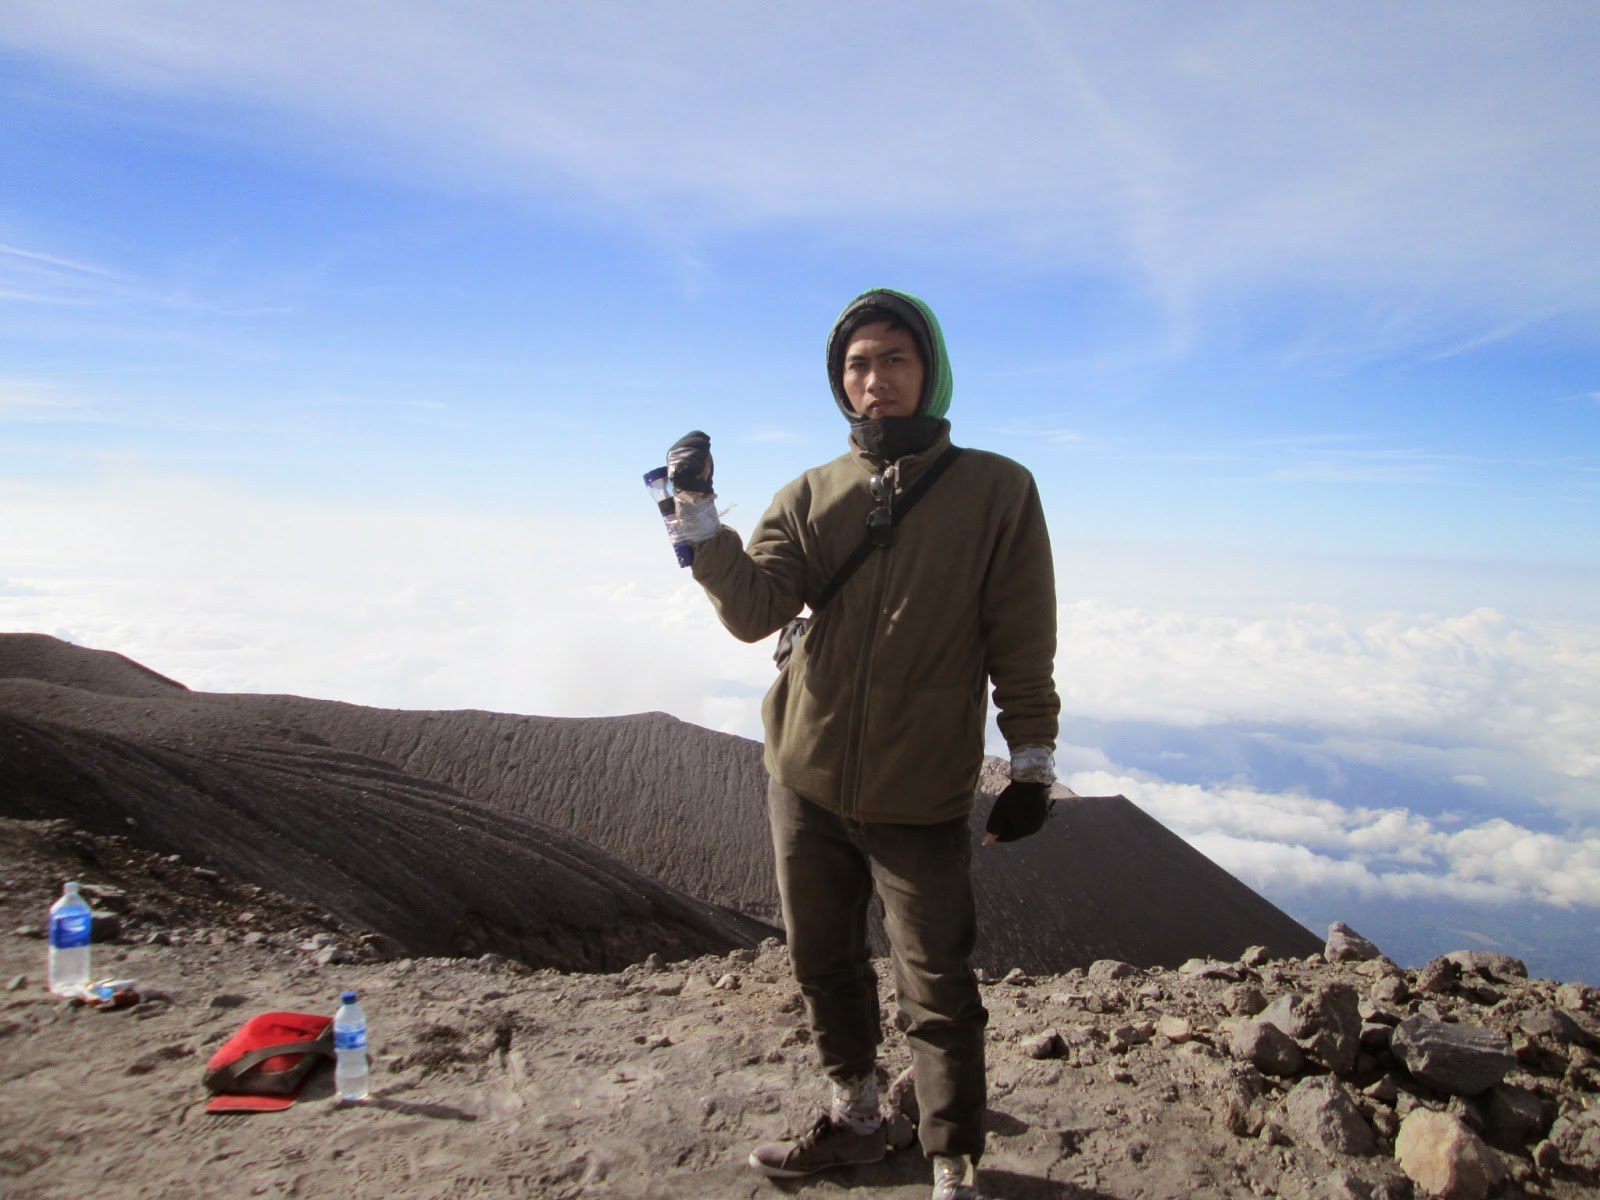 wisata gunung di jawa timur terpopuler